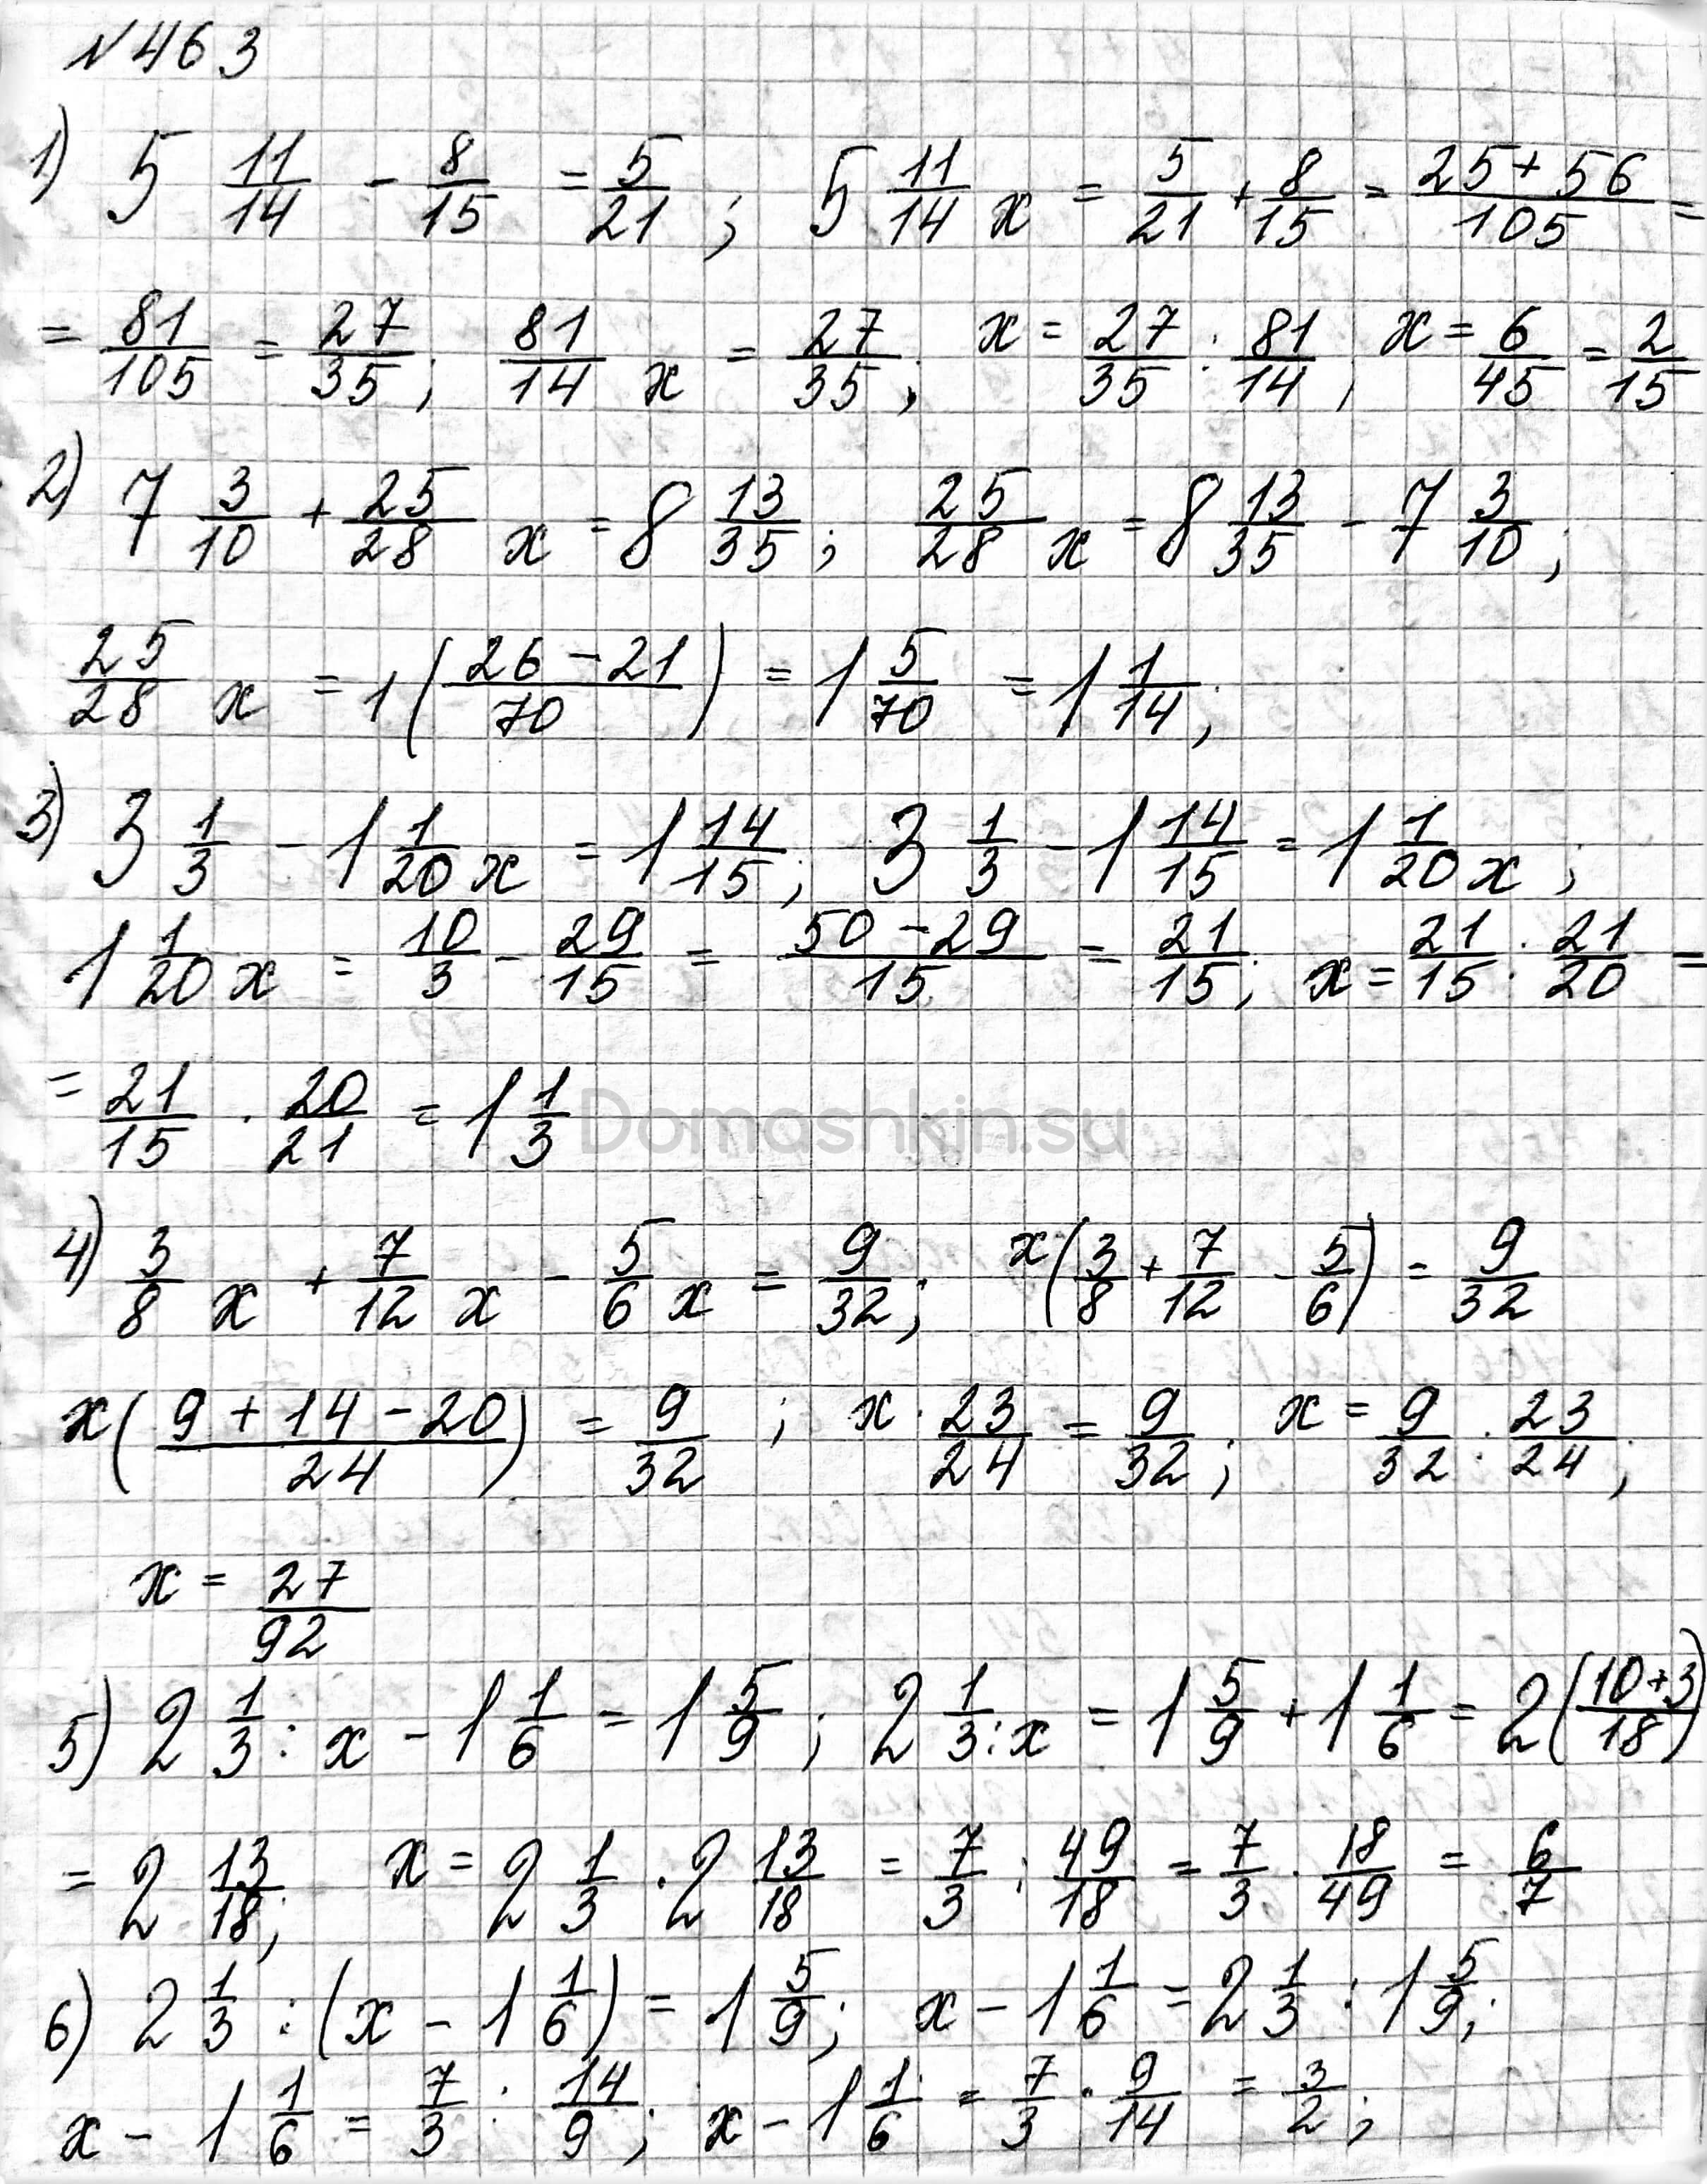 Математика 6 класс учебник Мерзляк номер 463 решение